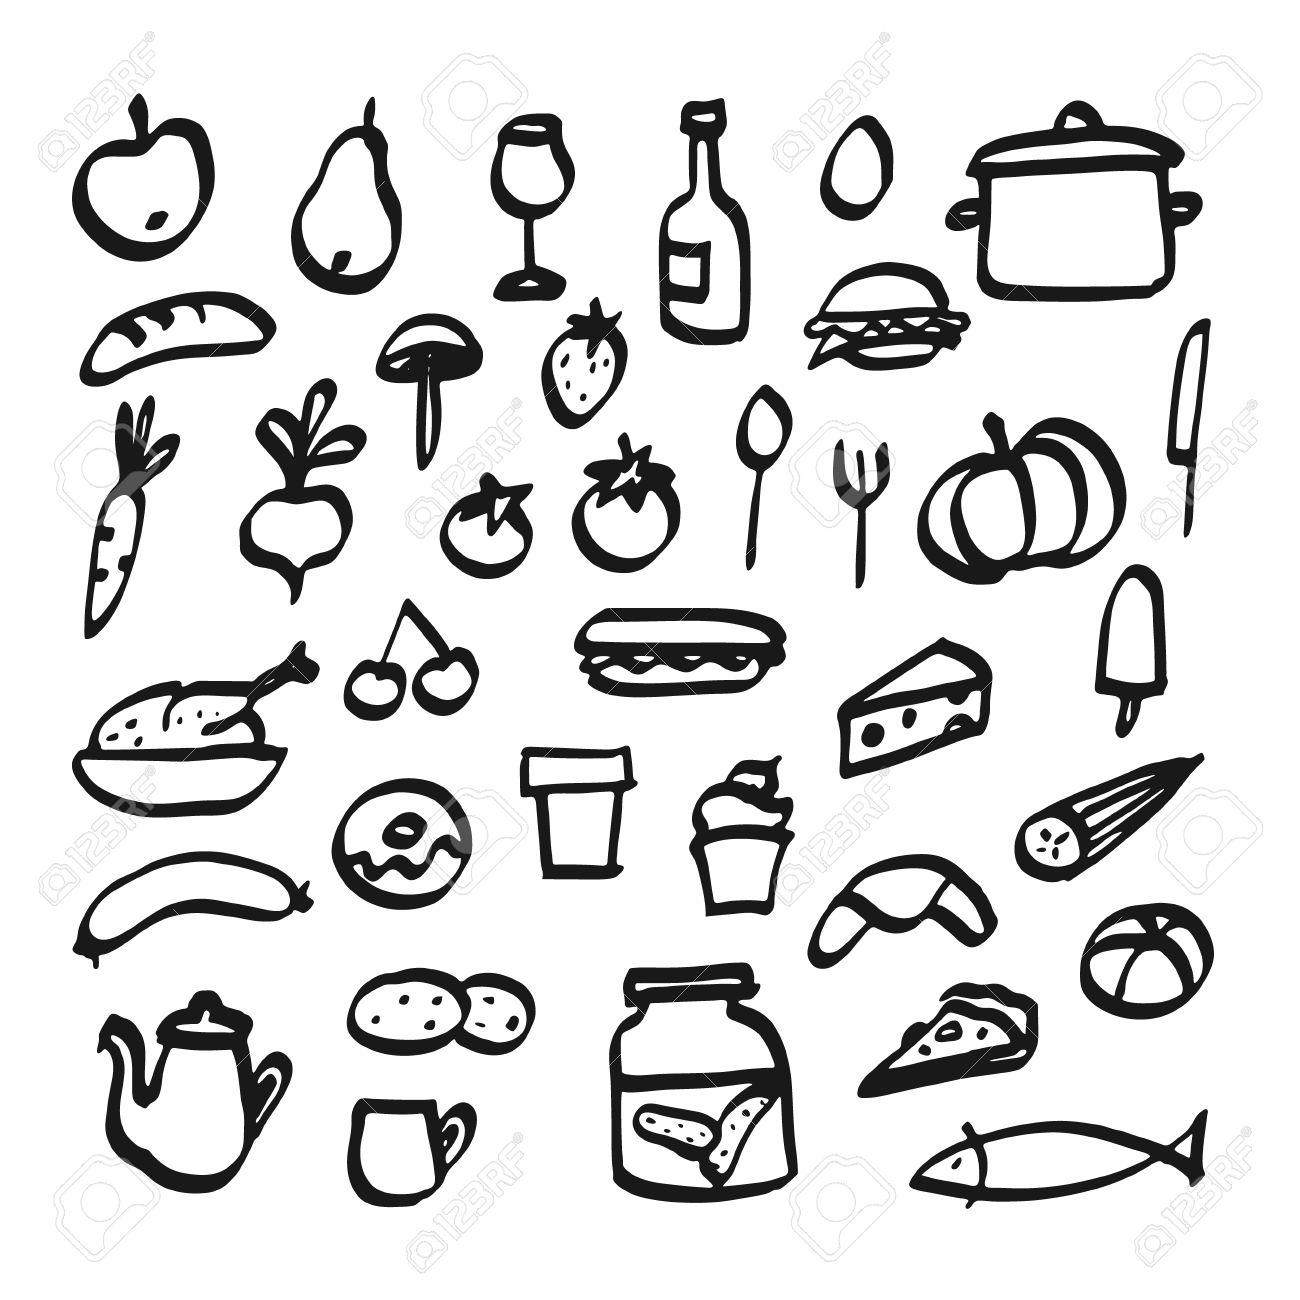 Emejing Disegni Da Cucina Contemporary - Ideas & Design 2017 ...